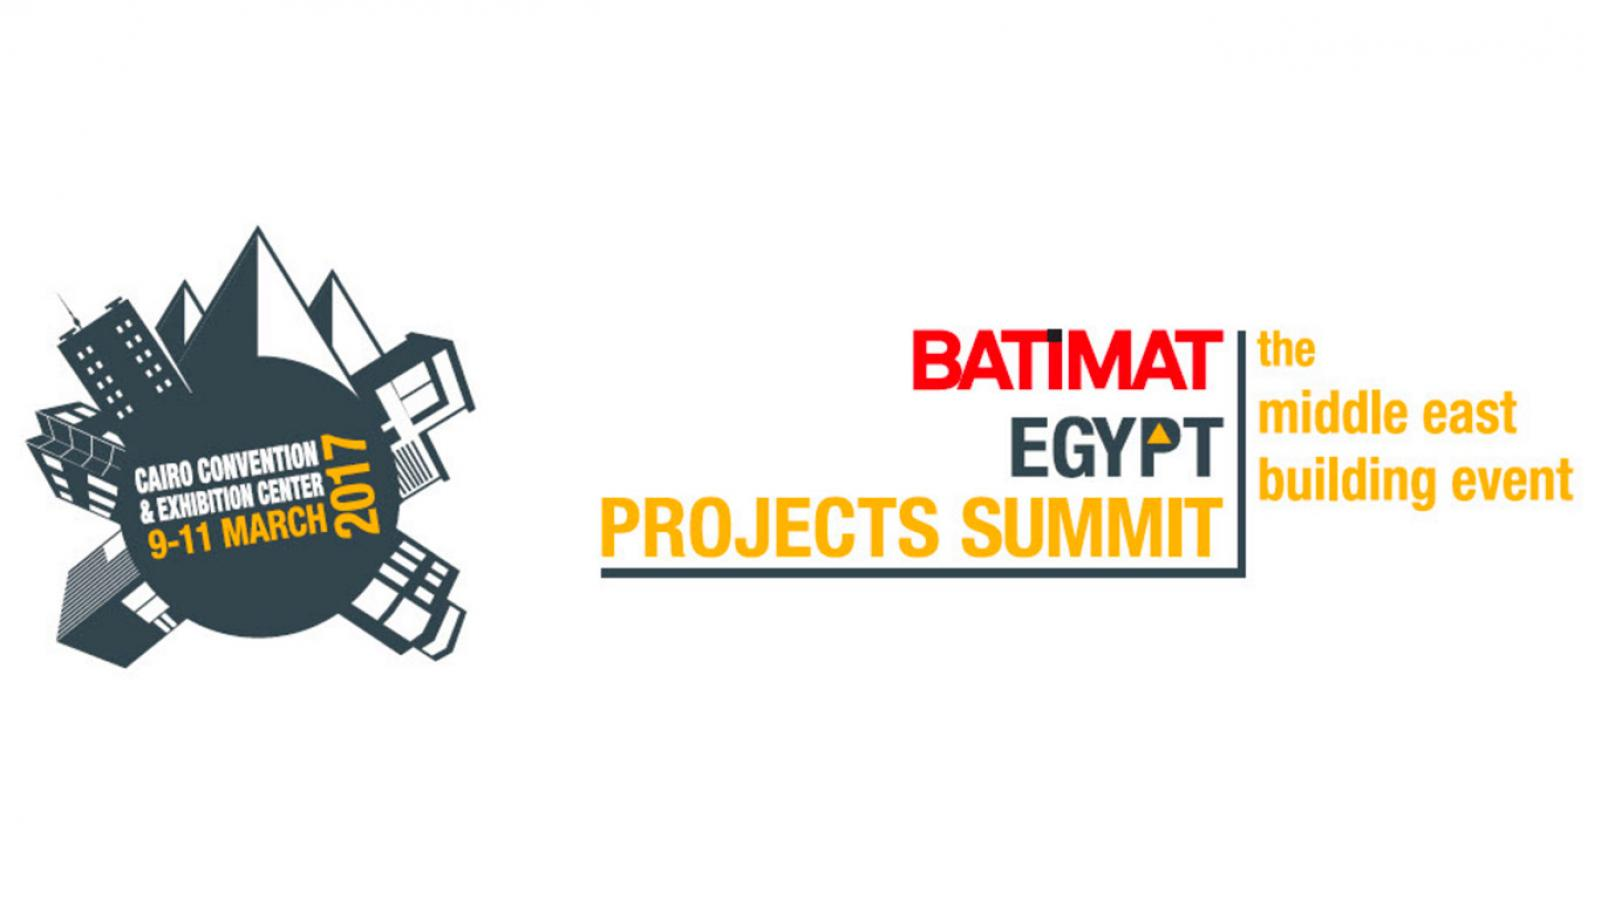 BATIMAT EGYPT